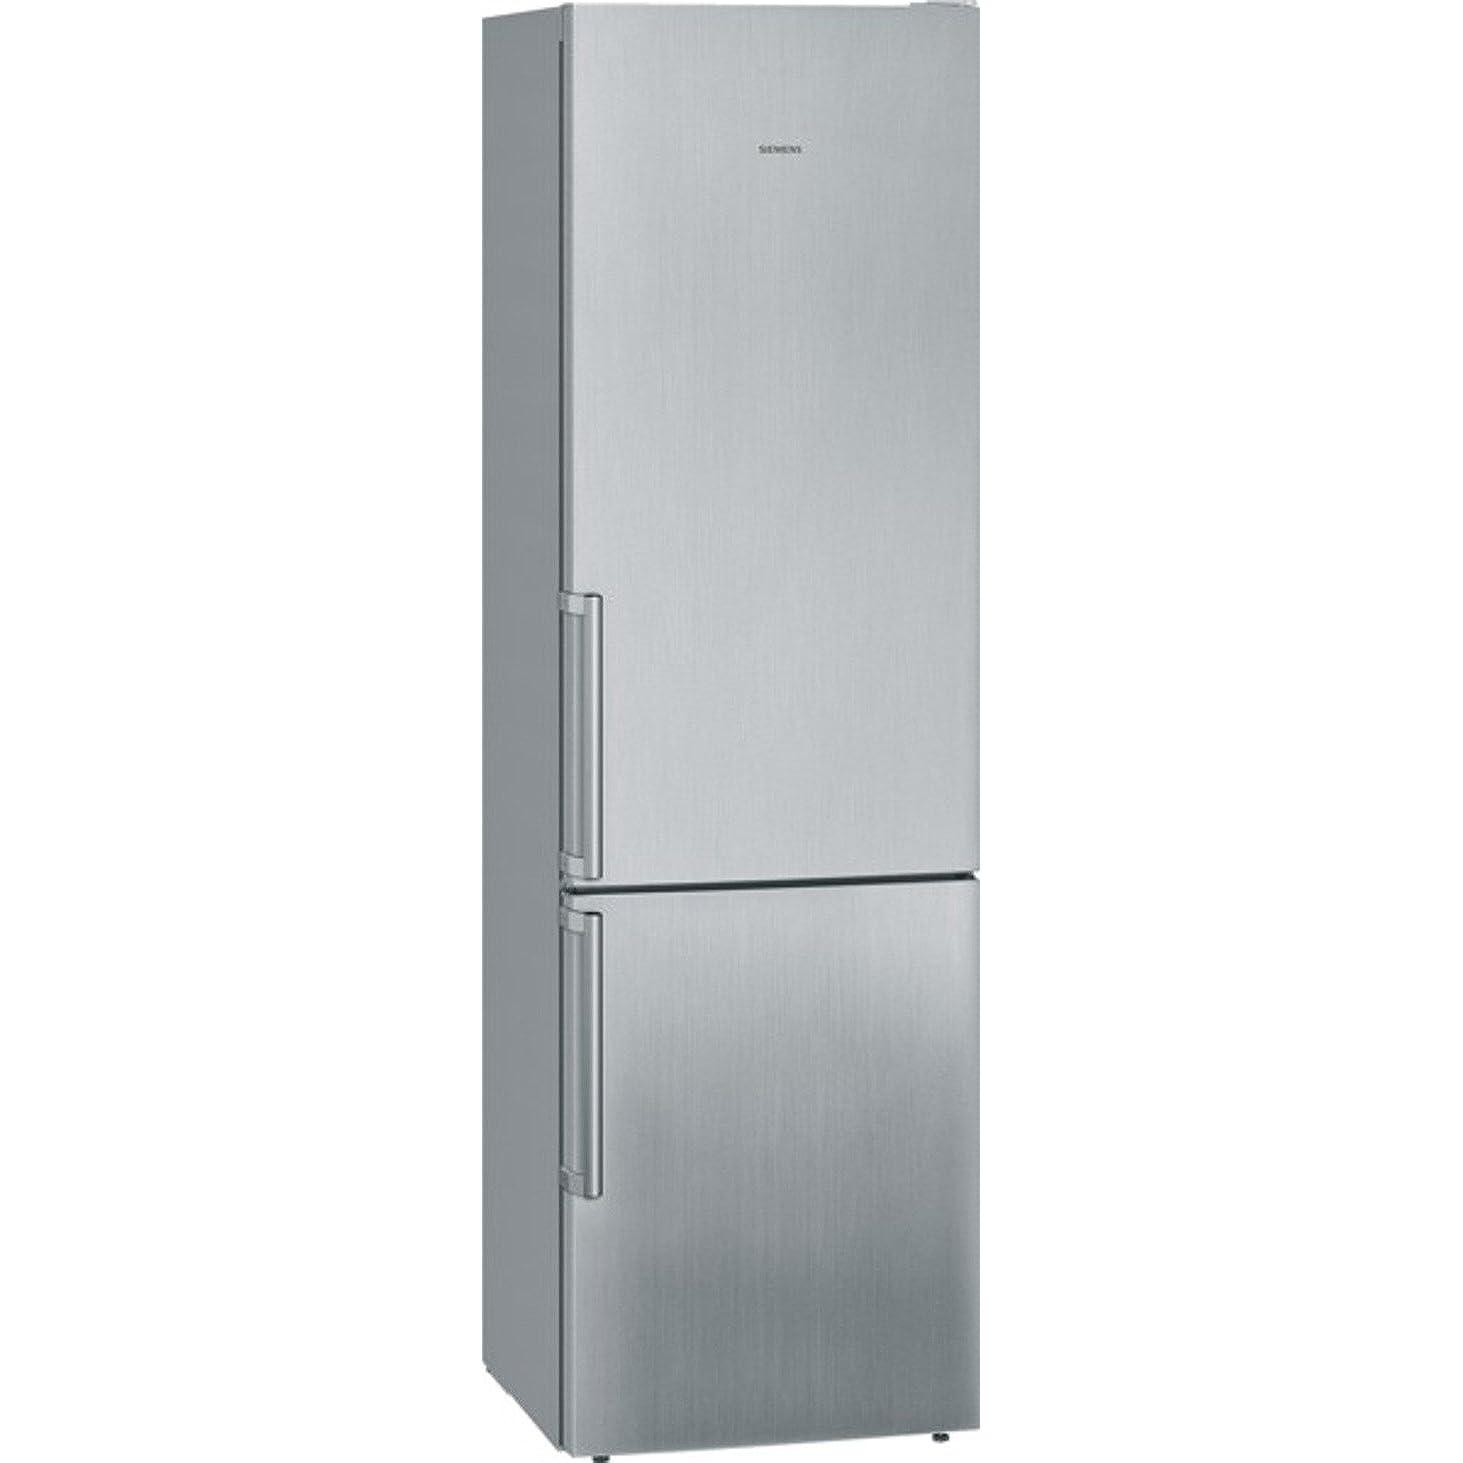 Siemens KG39EAL43 iQ500